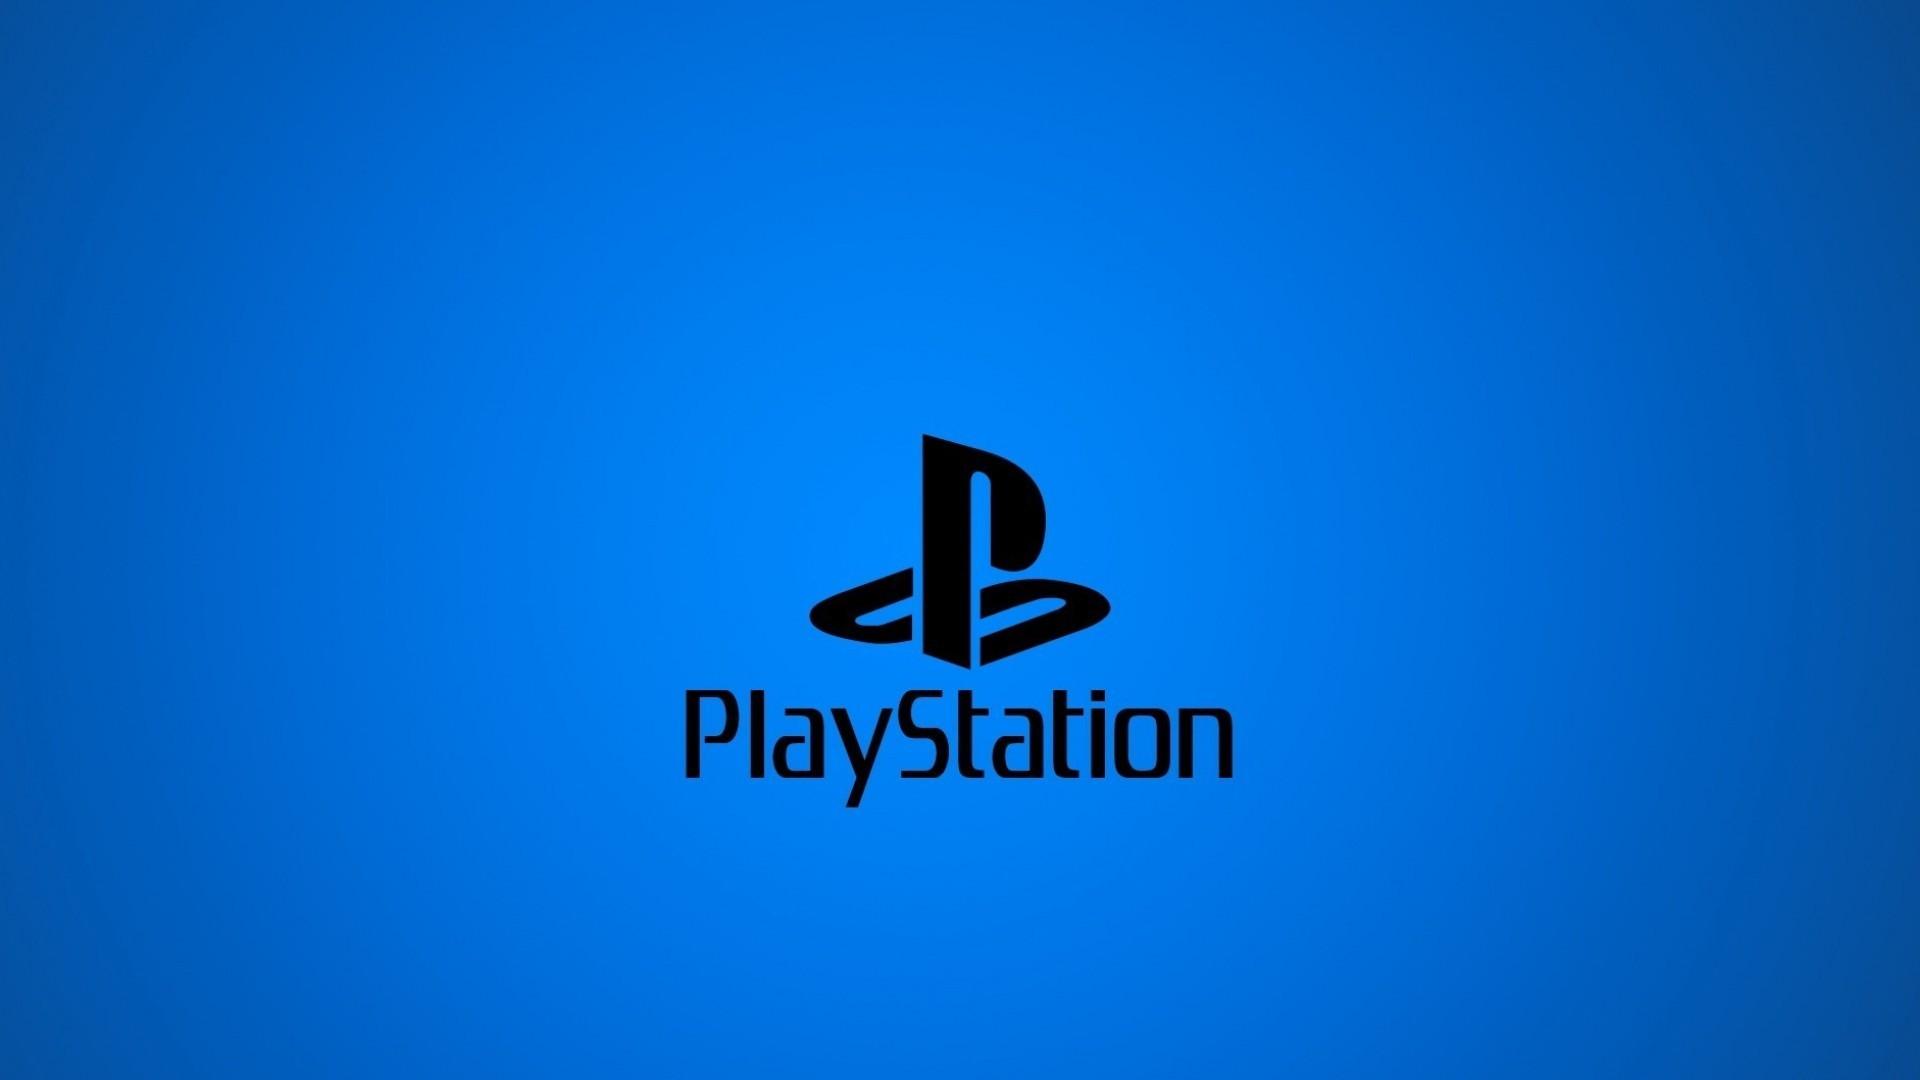 Playstation. Playstation 4 Wallpaper by Chadski51